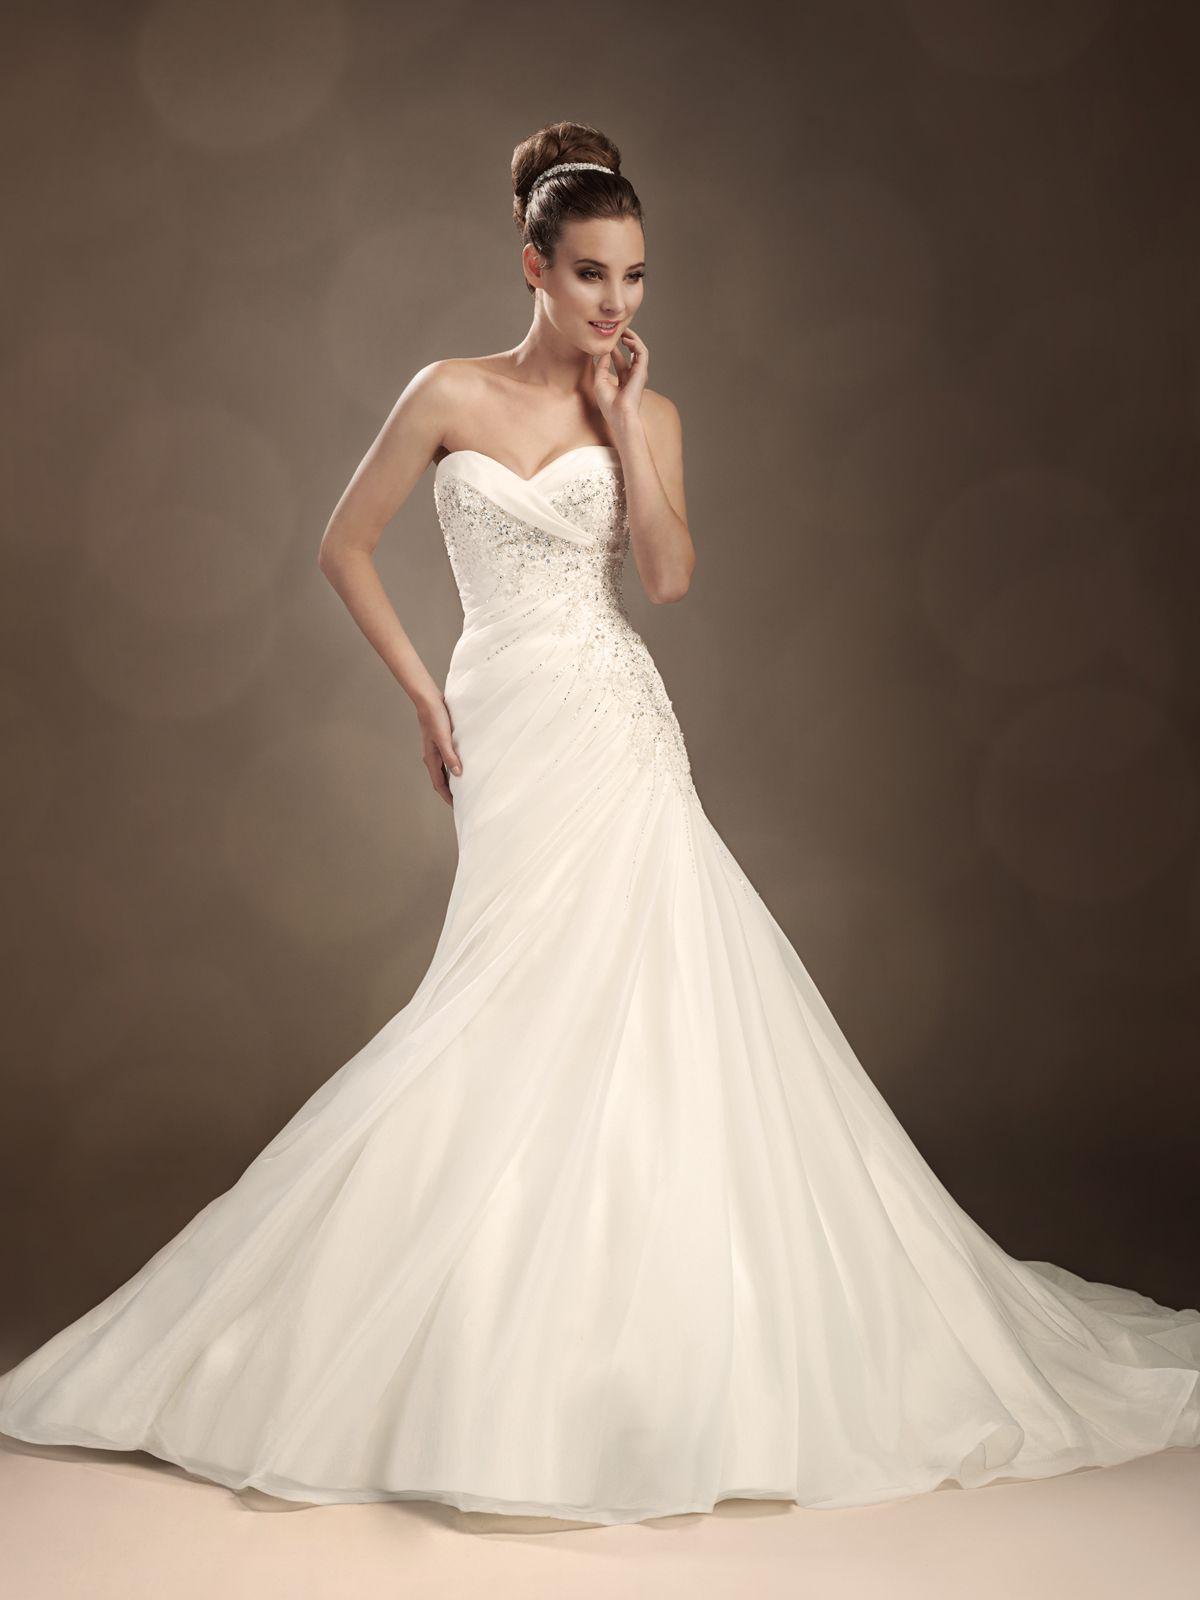 Strapless Mermaid Lace Wedding Dress Miami